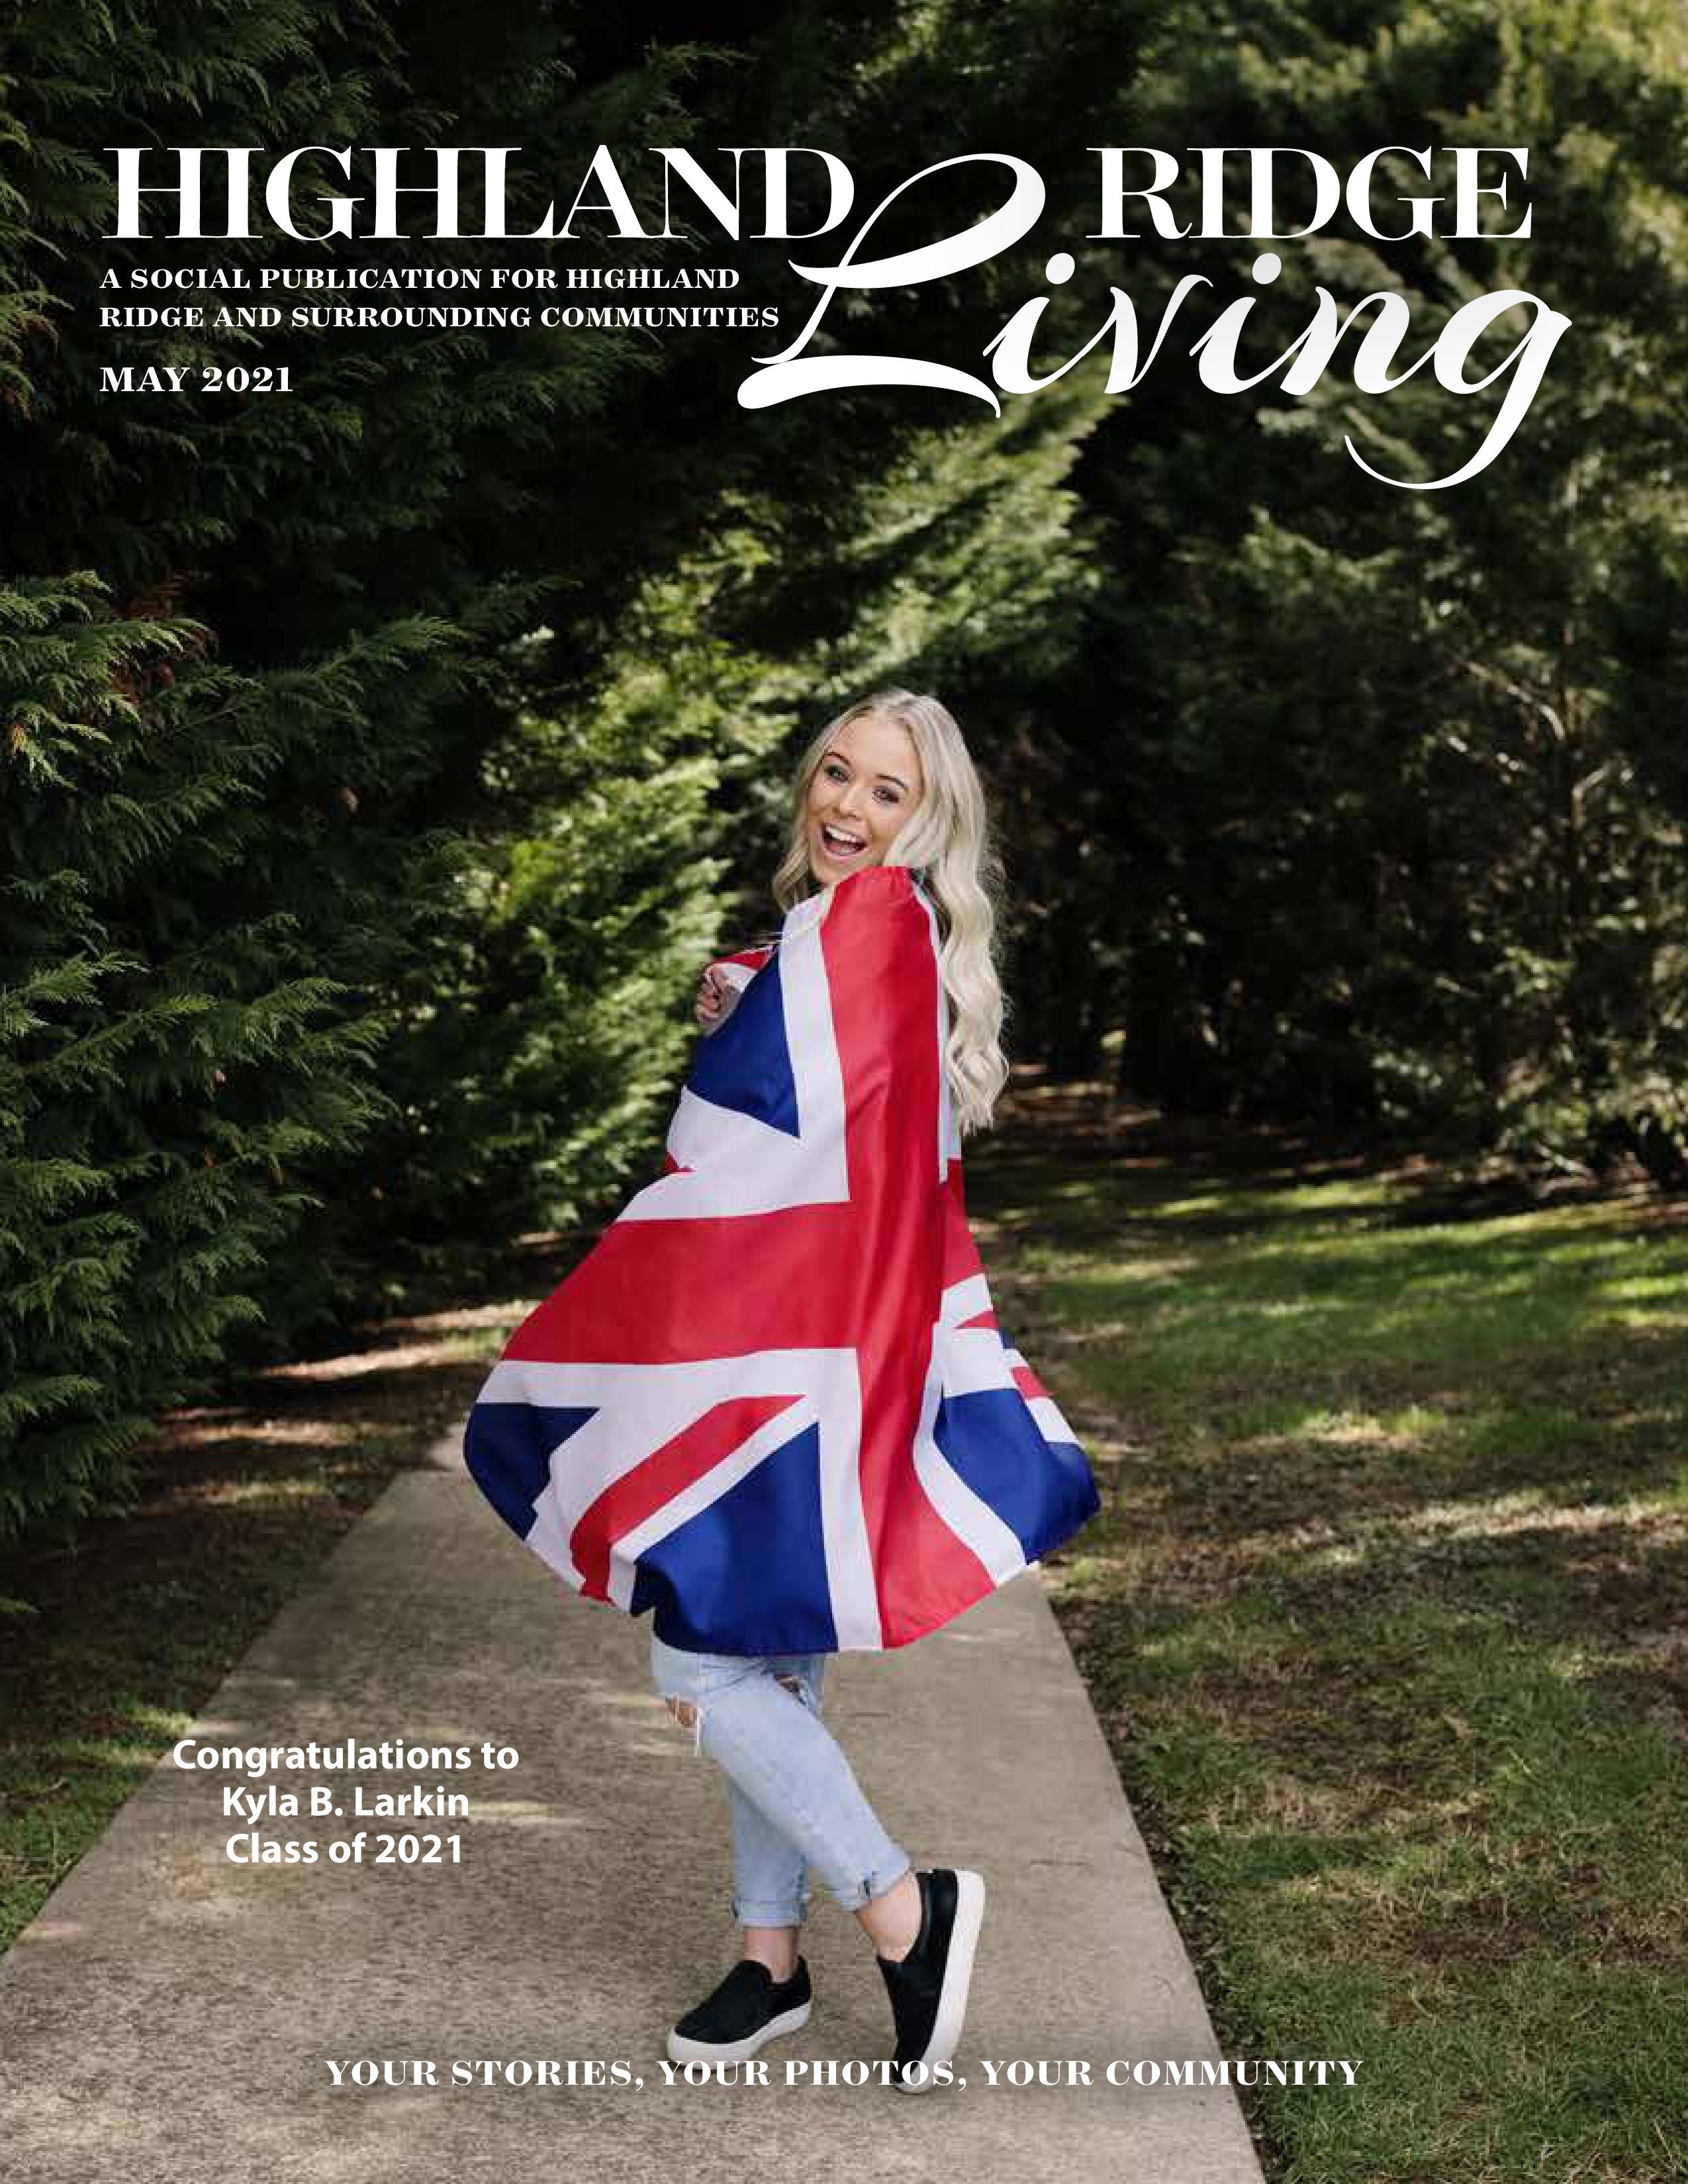 Highland Ridge Living 2021-05-01